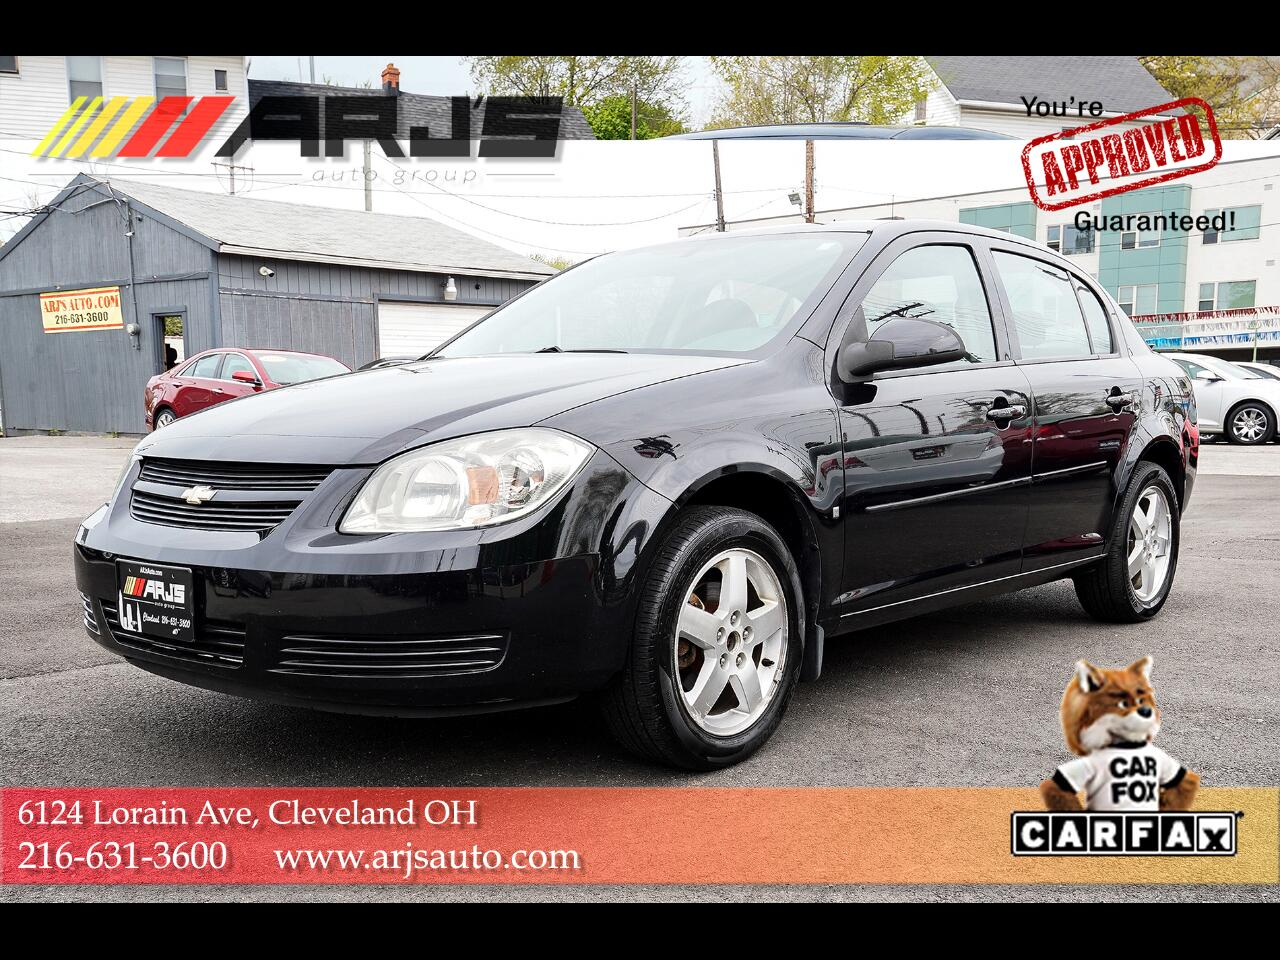 Chevrolet Cobalt 4dr Sdn LT w/1LT 2009